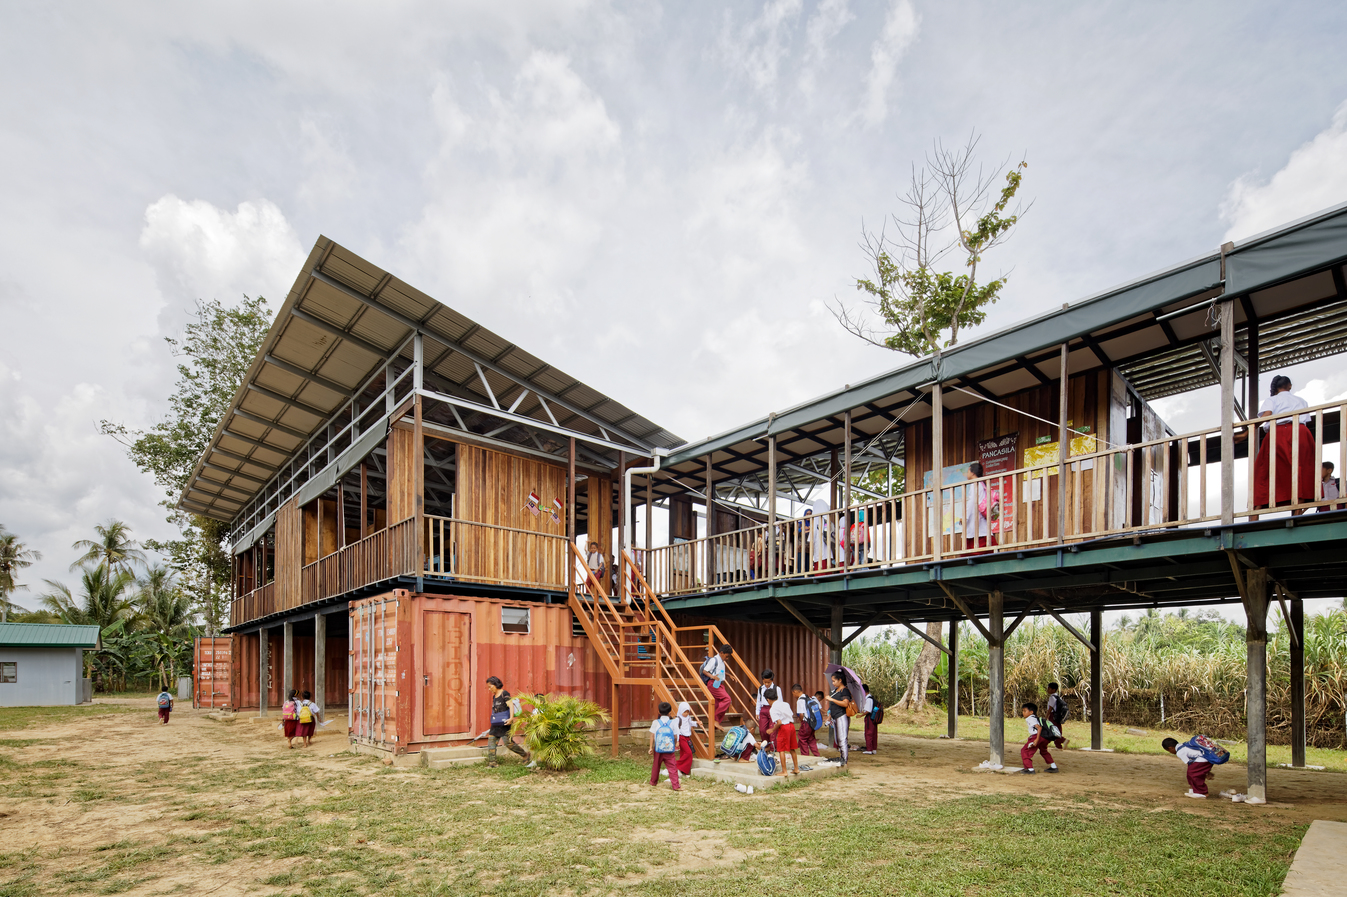 resized20_Architecture-BRIO_Etania_Matakana Learning Centre_340_South East Exterior View.jpg